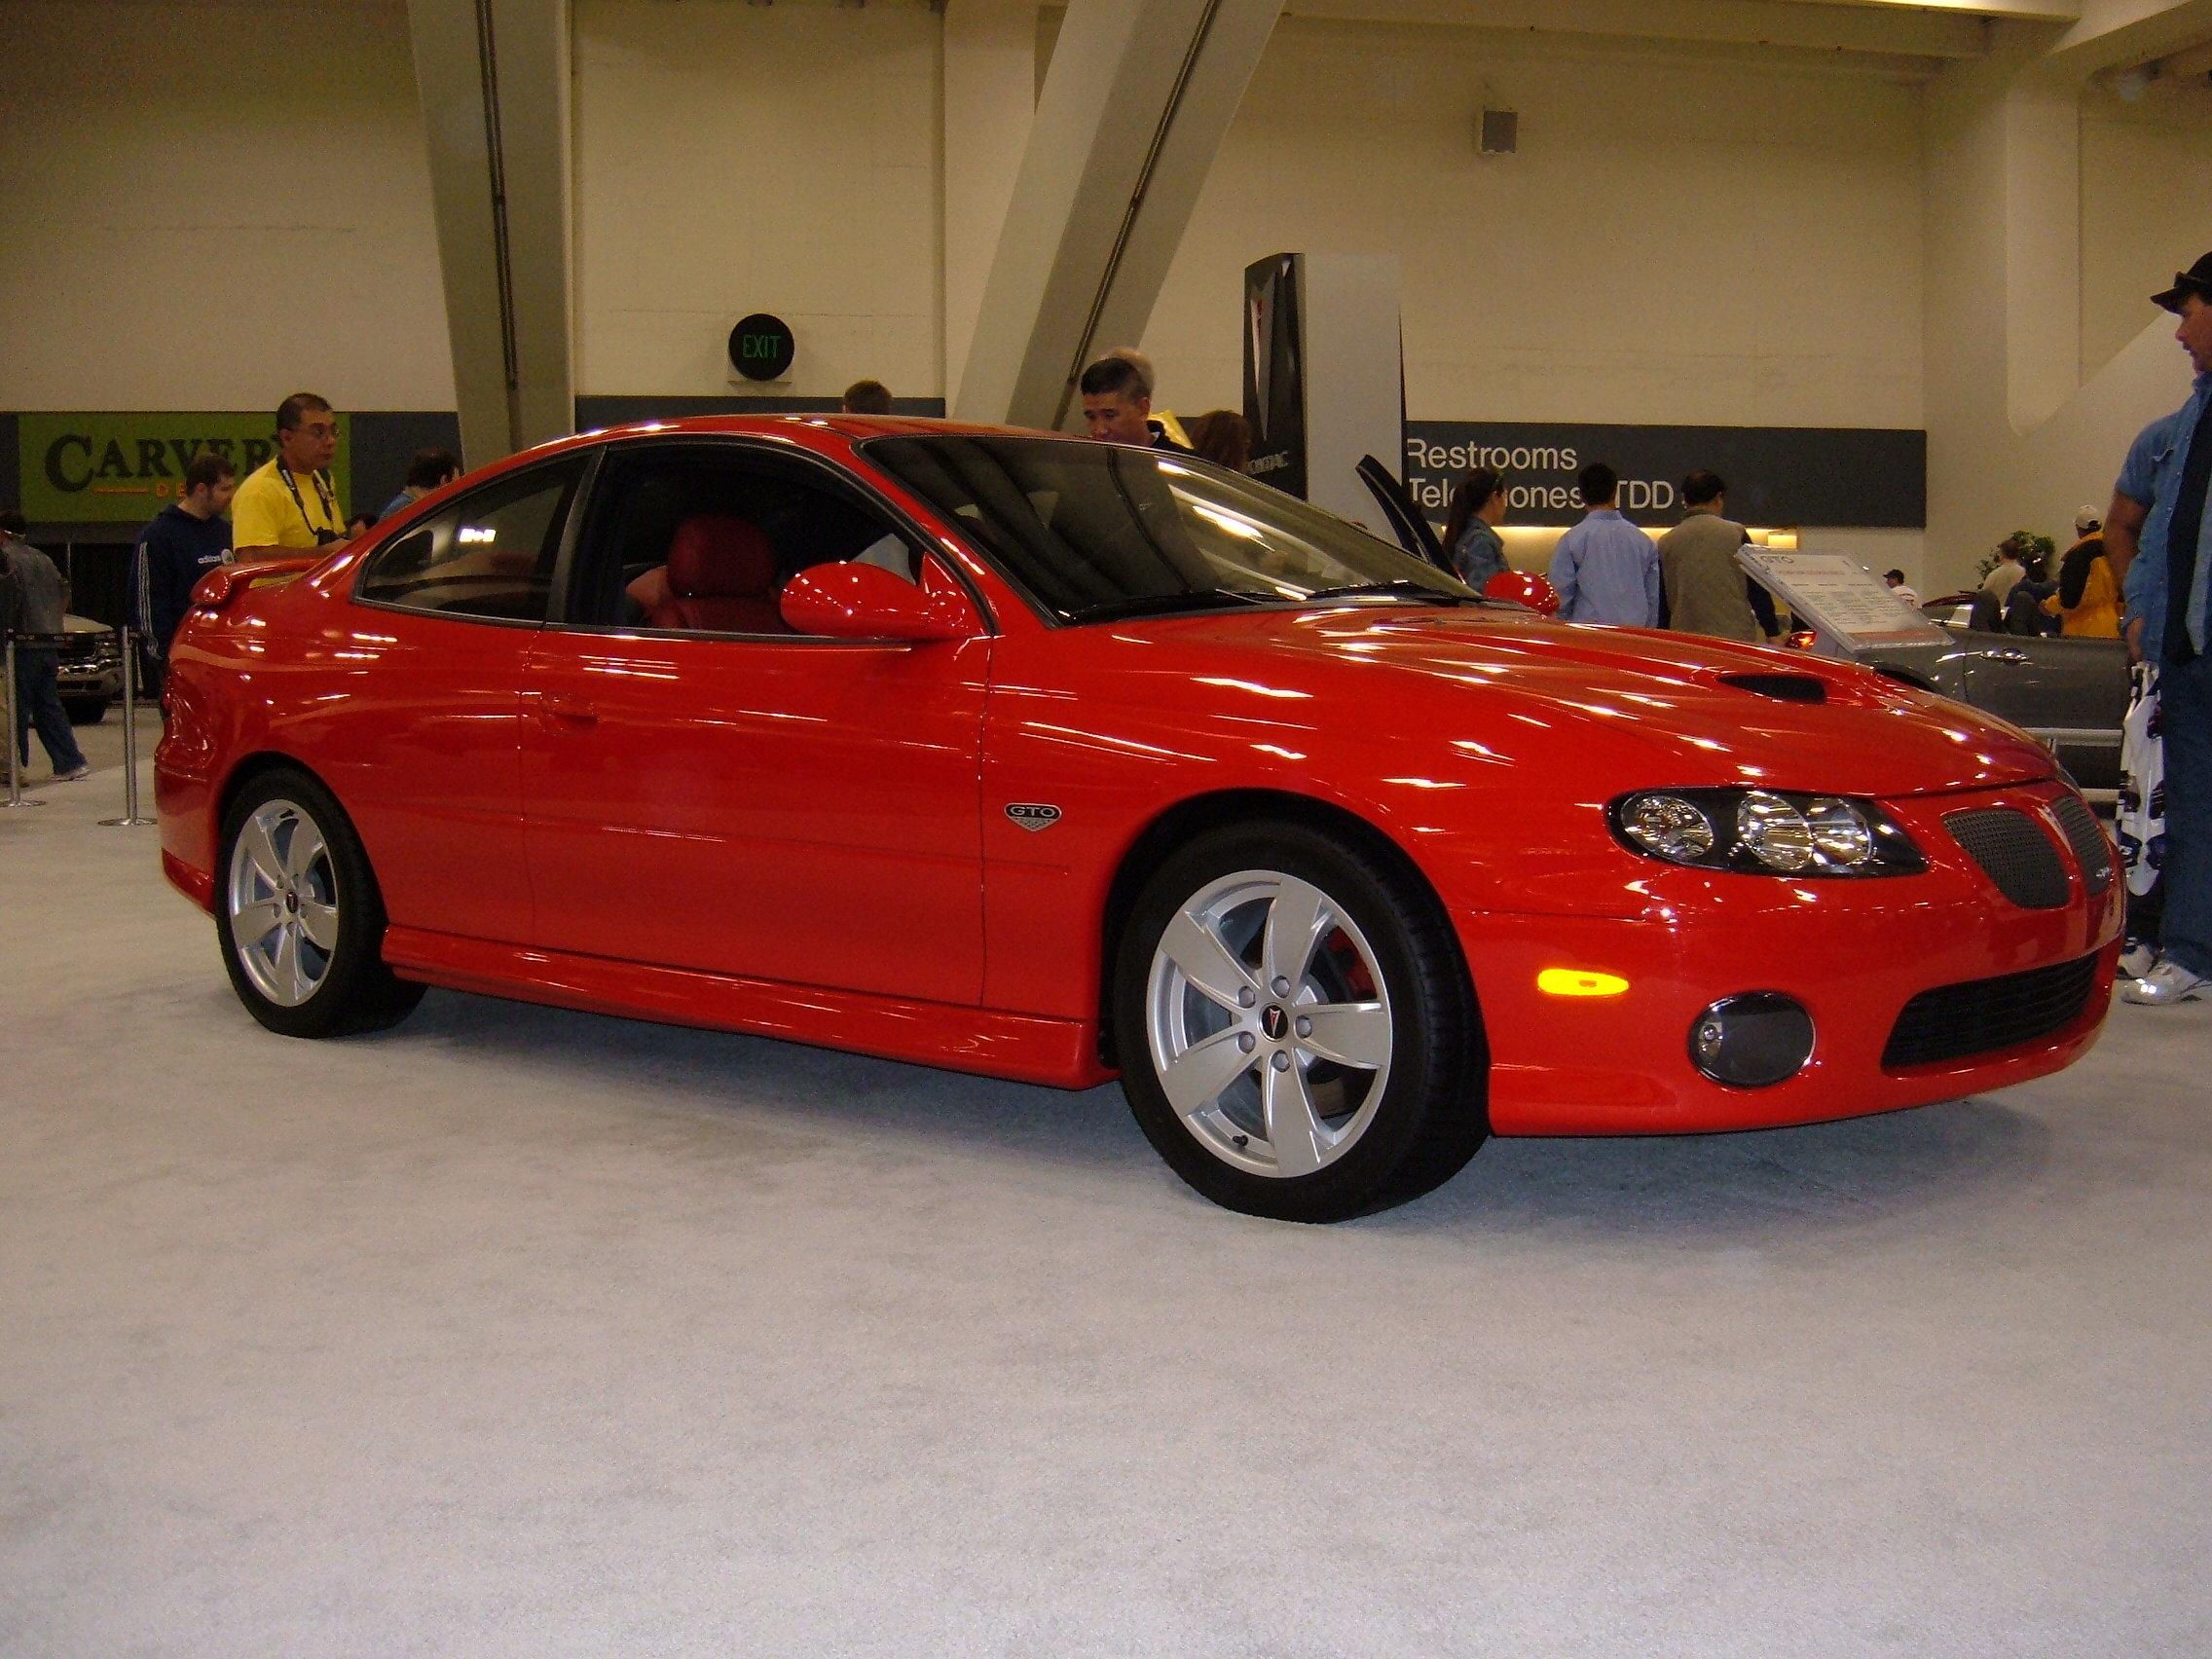 File:2005 red Pontiac GTO side.JPG - Wikimedia Commons